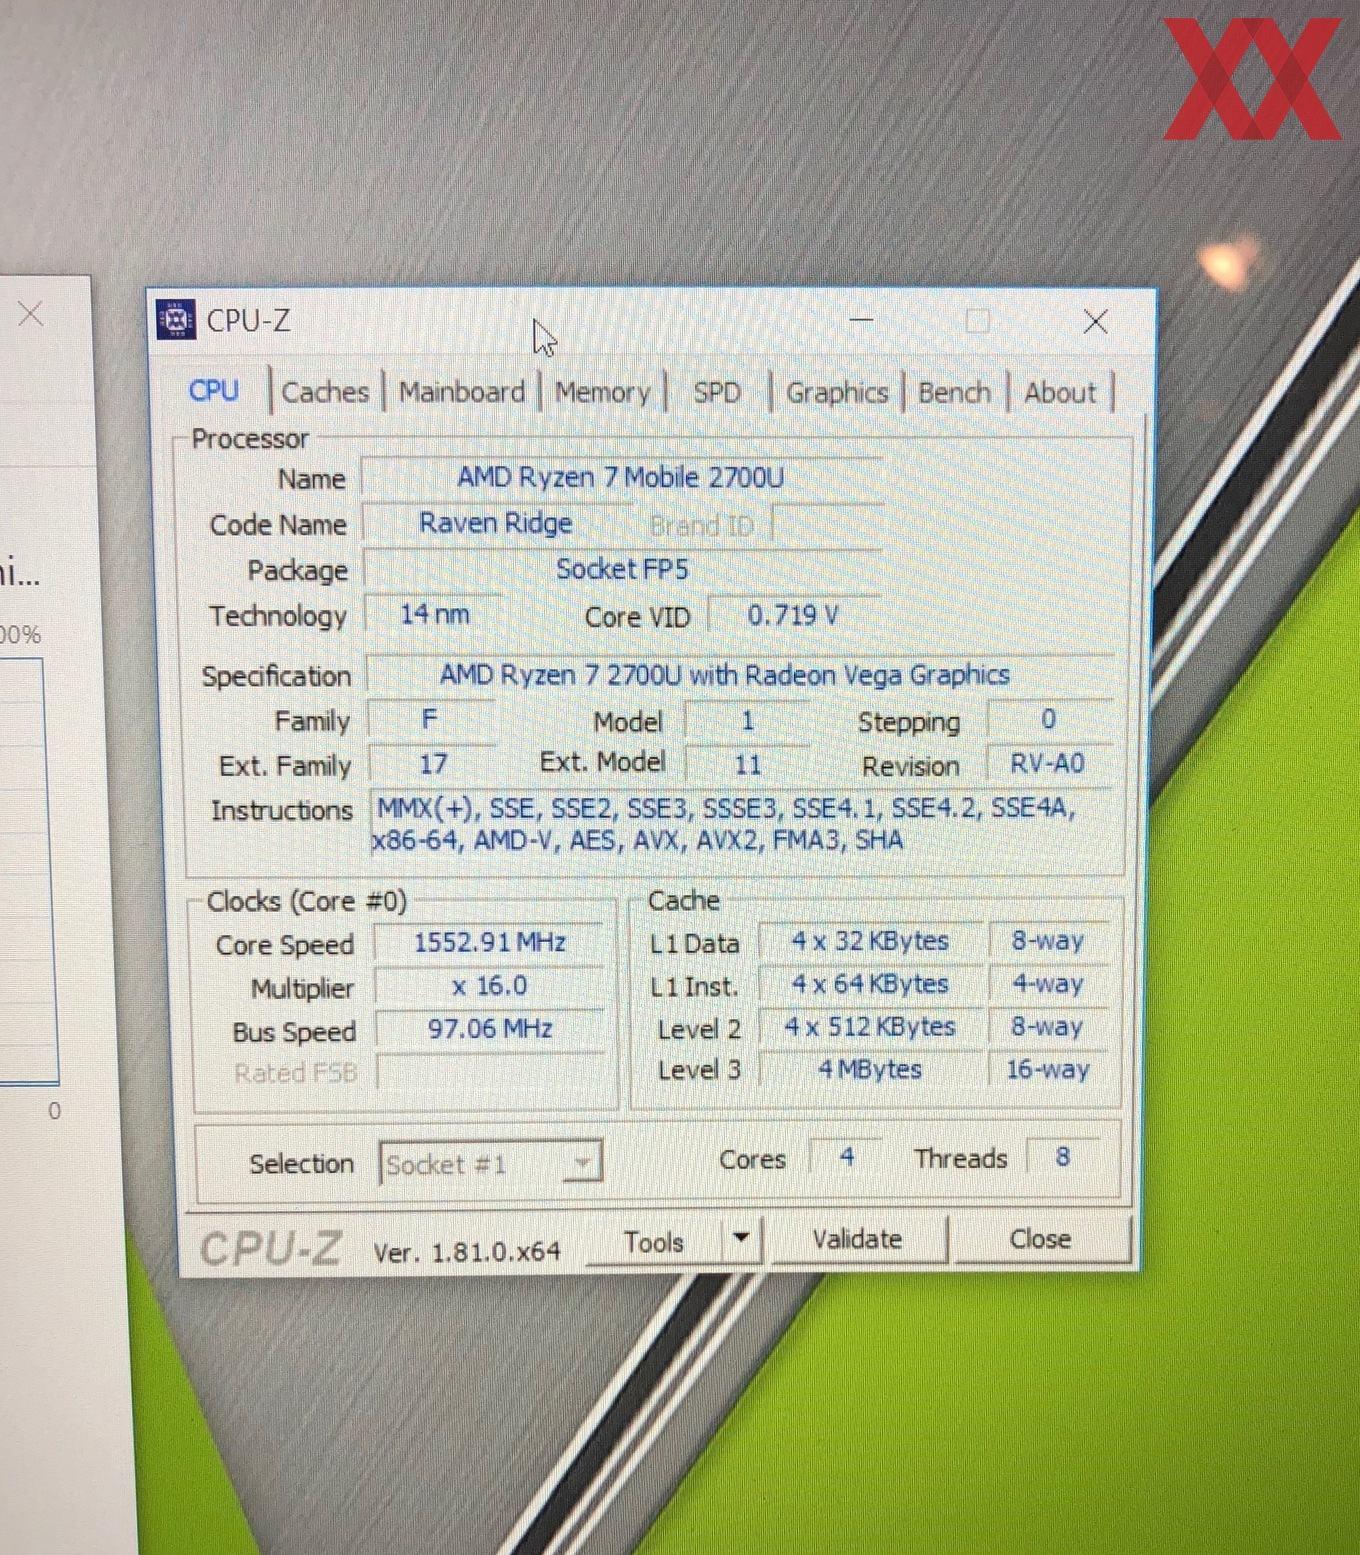 Amd Ryzen 7 2700U Mobile Processor – Meta Morphoz